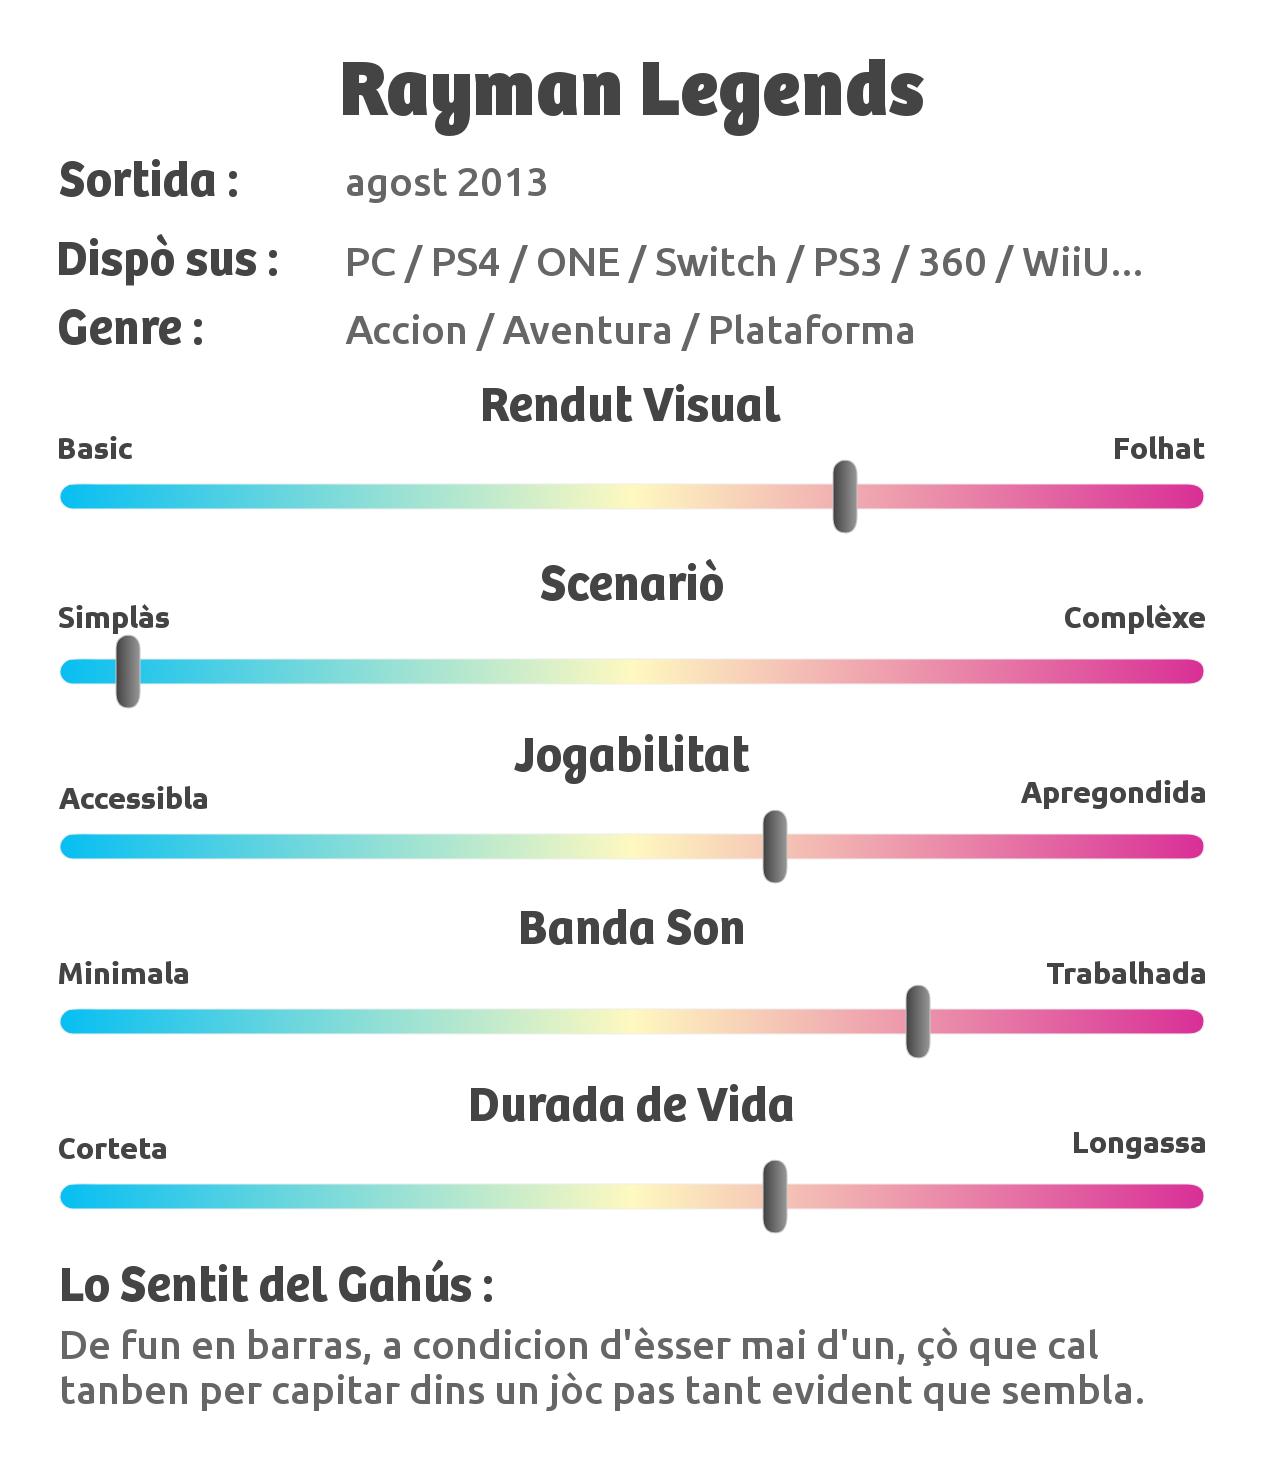 Evaluacion Rayman Legends